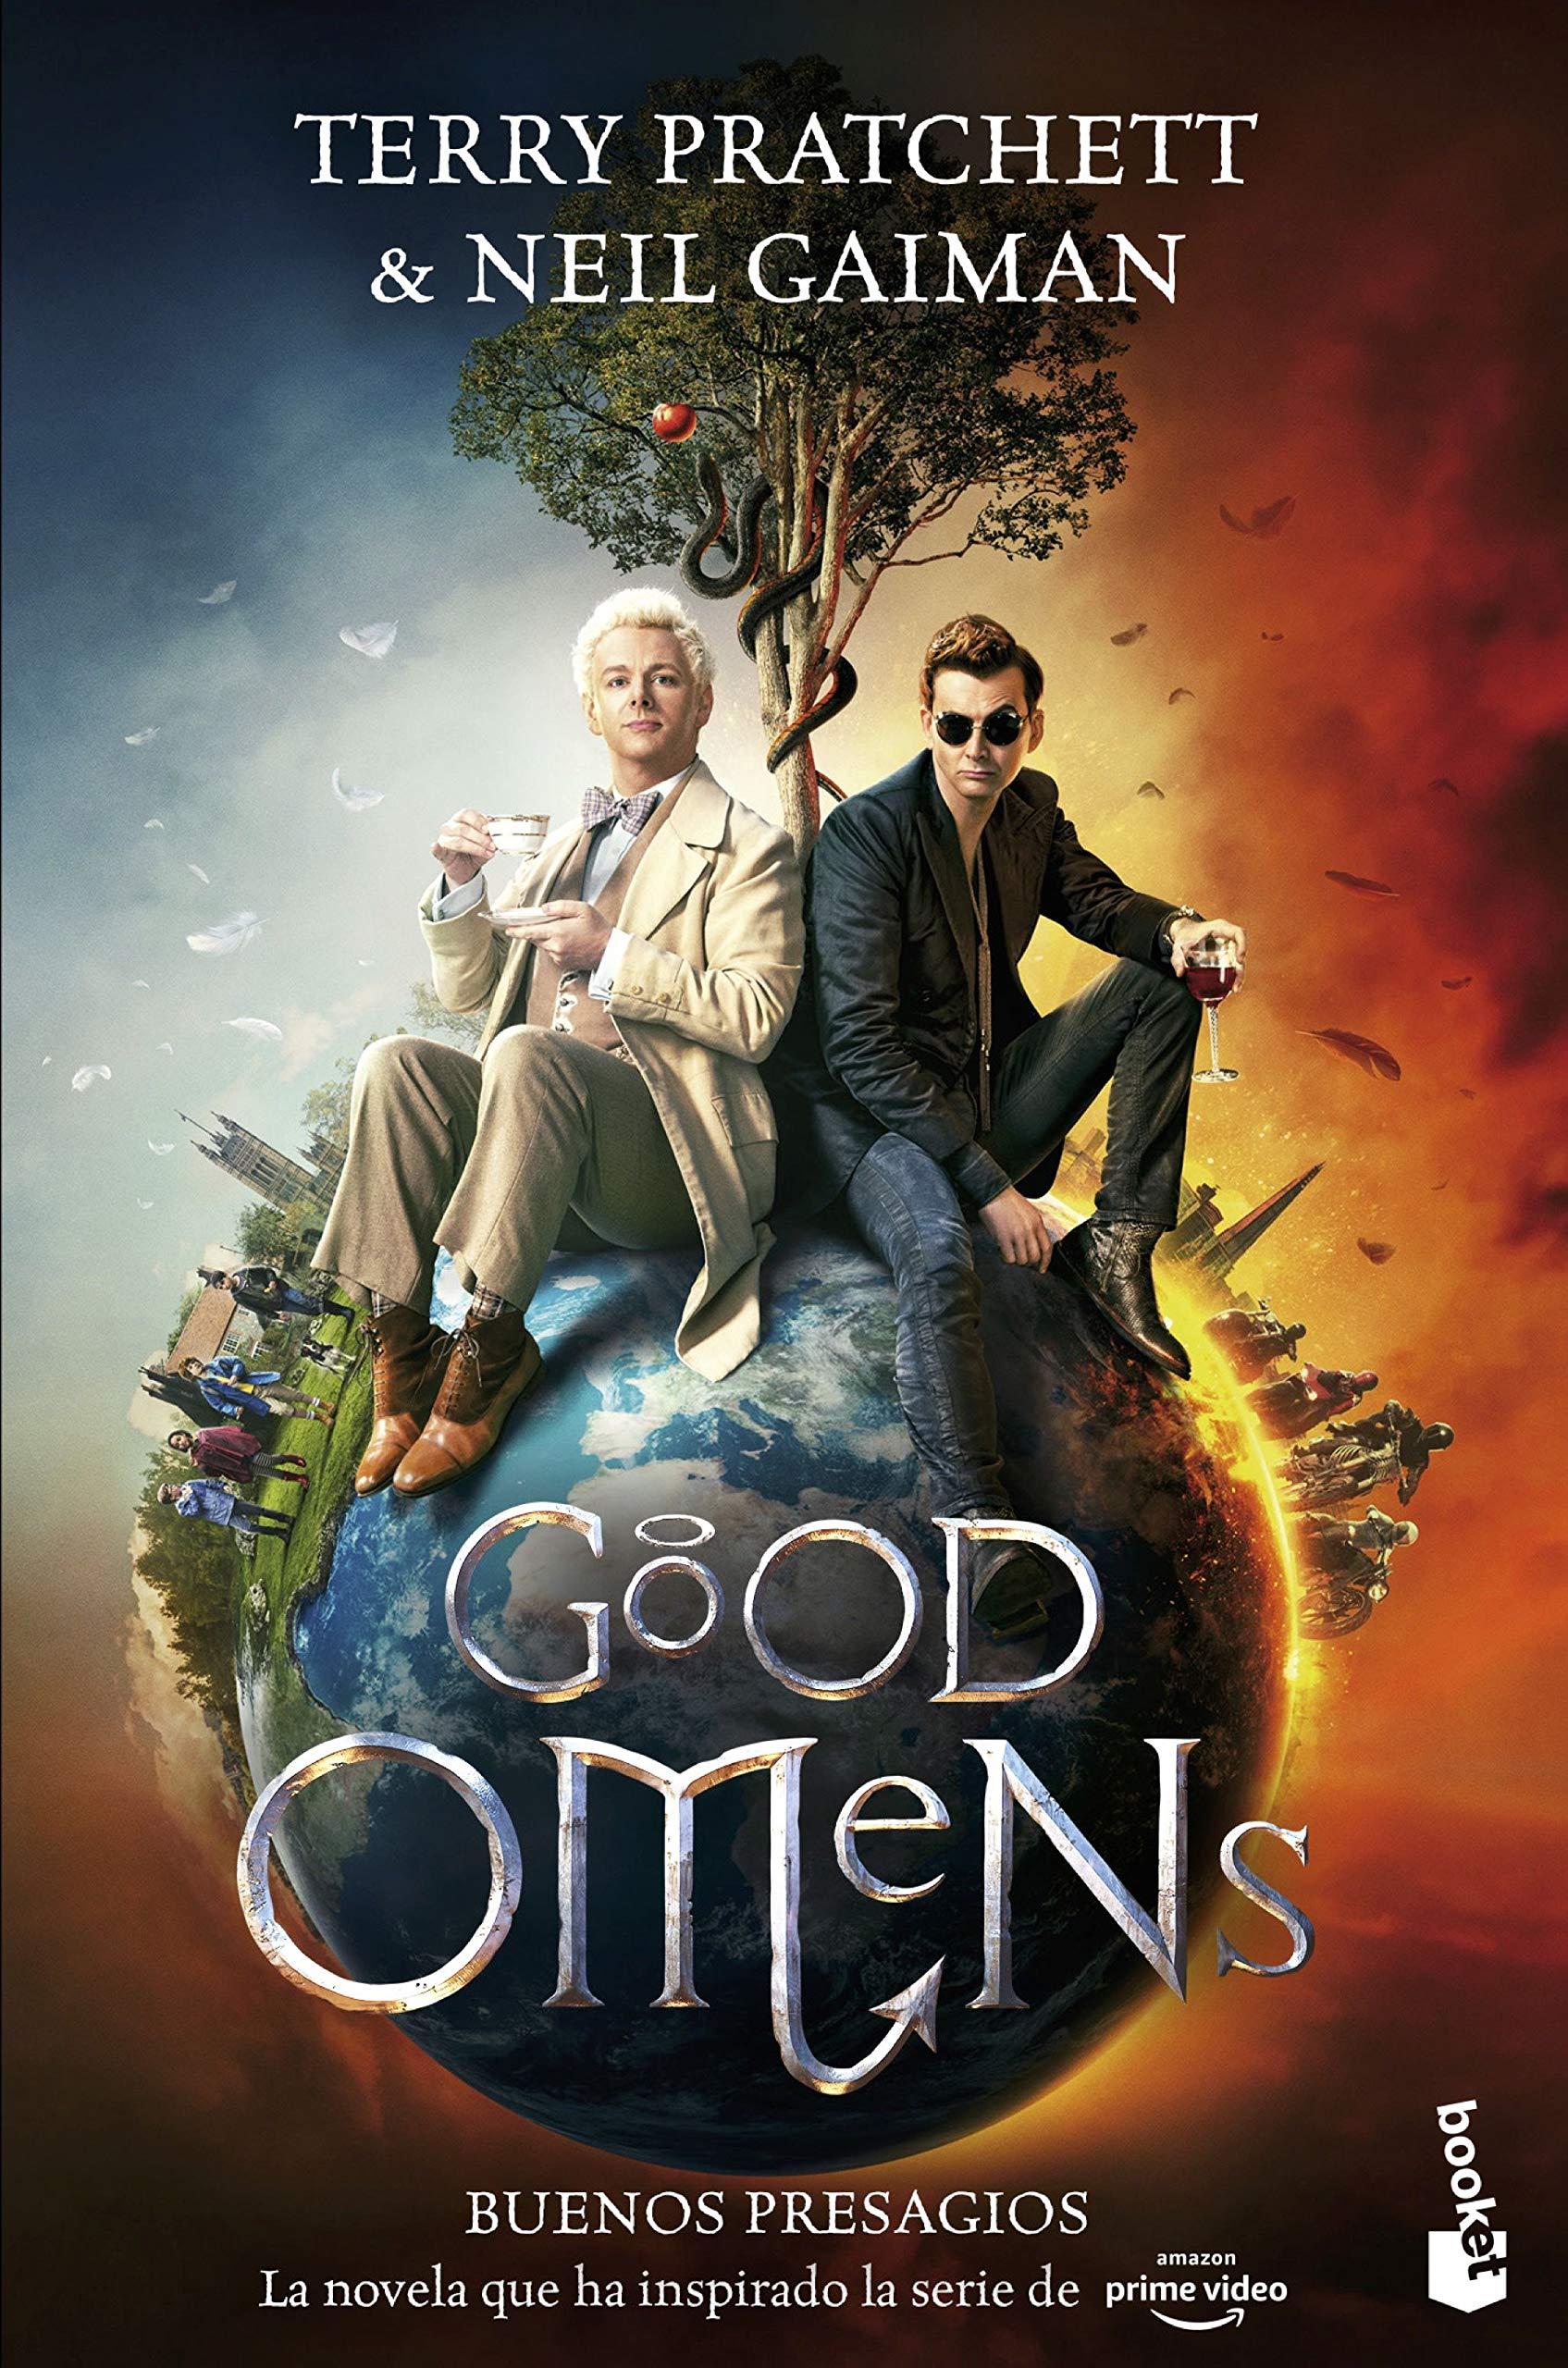 Good Omens (Buenos presagios) (Literatura Fantástica) por Terry Pratchett